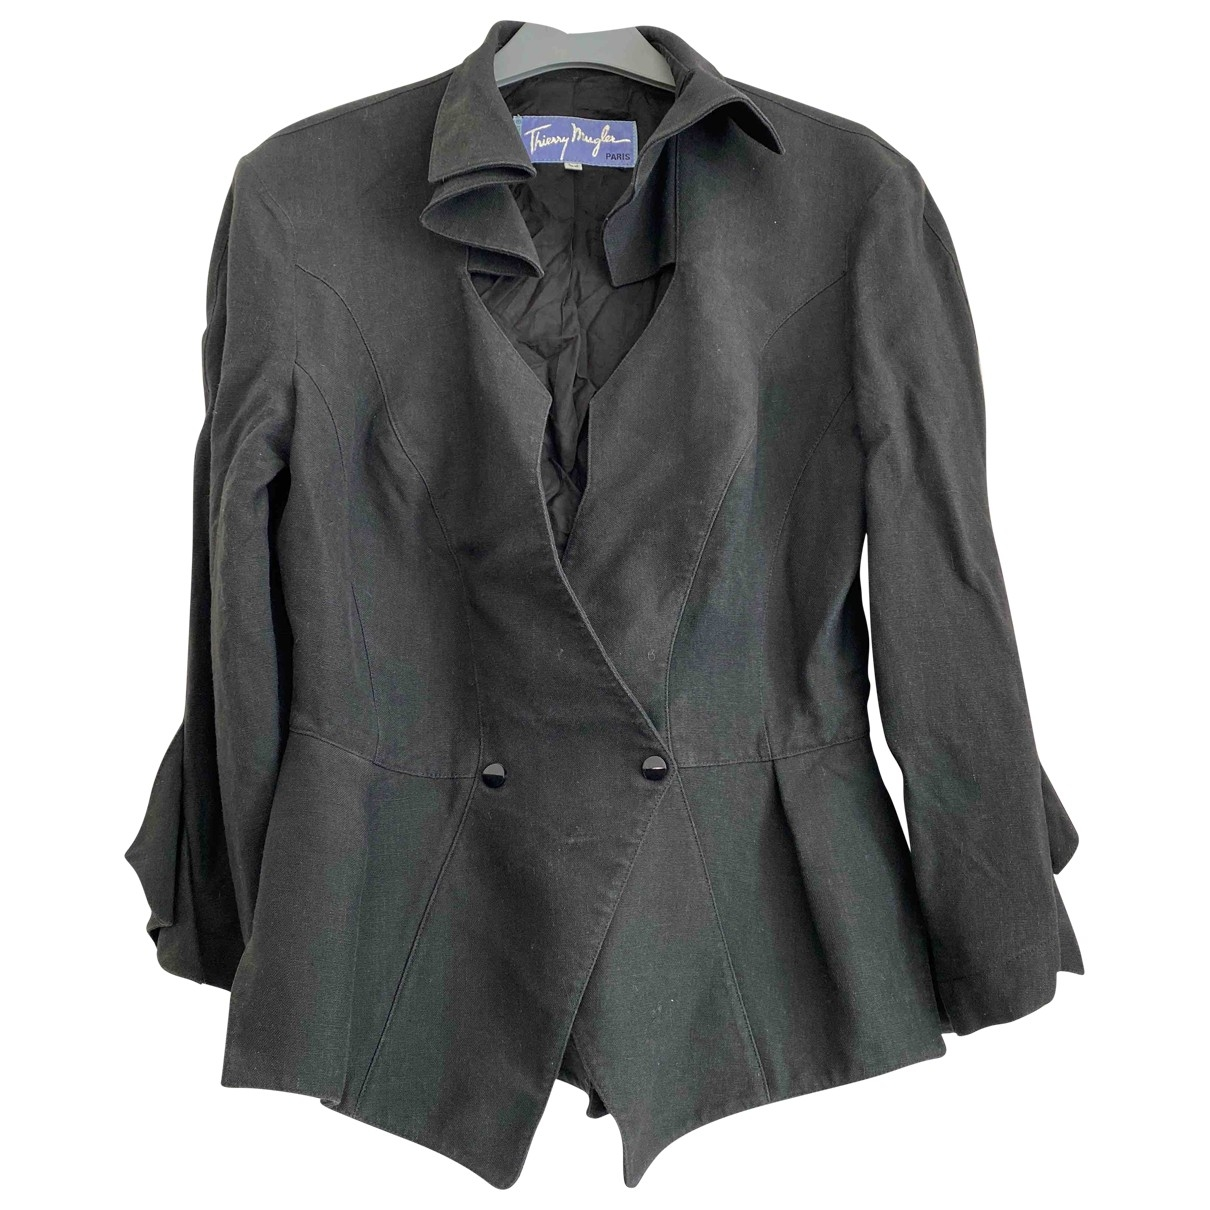 Thierry Mugler \N Black jacket for Women 40 FR